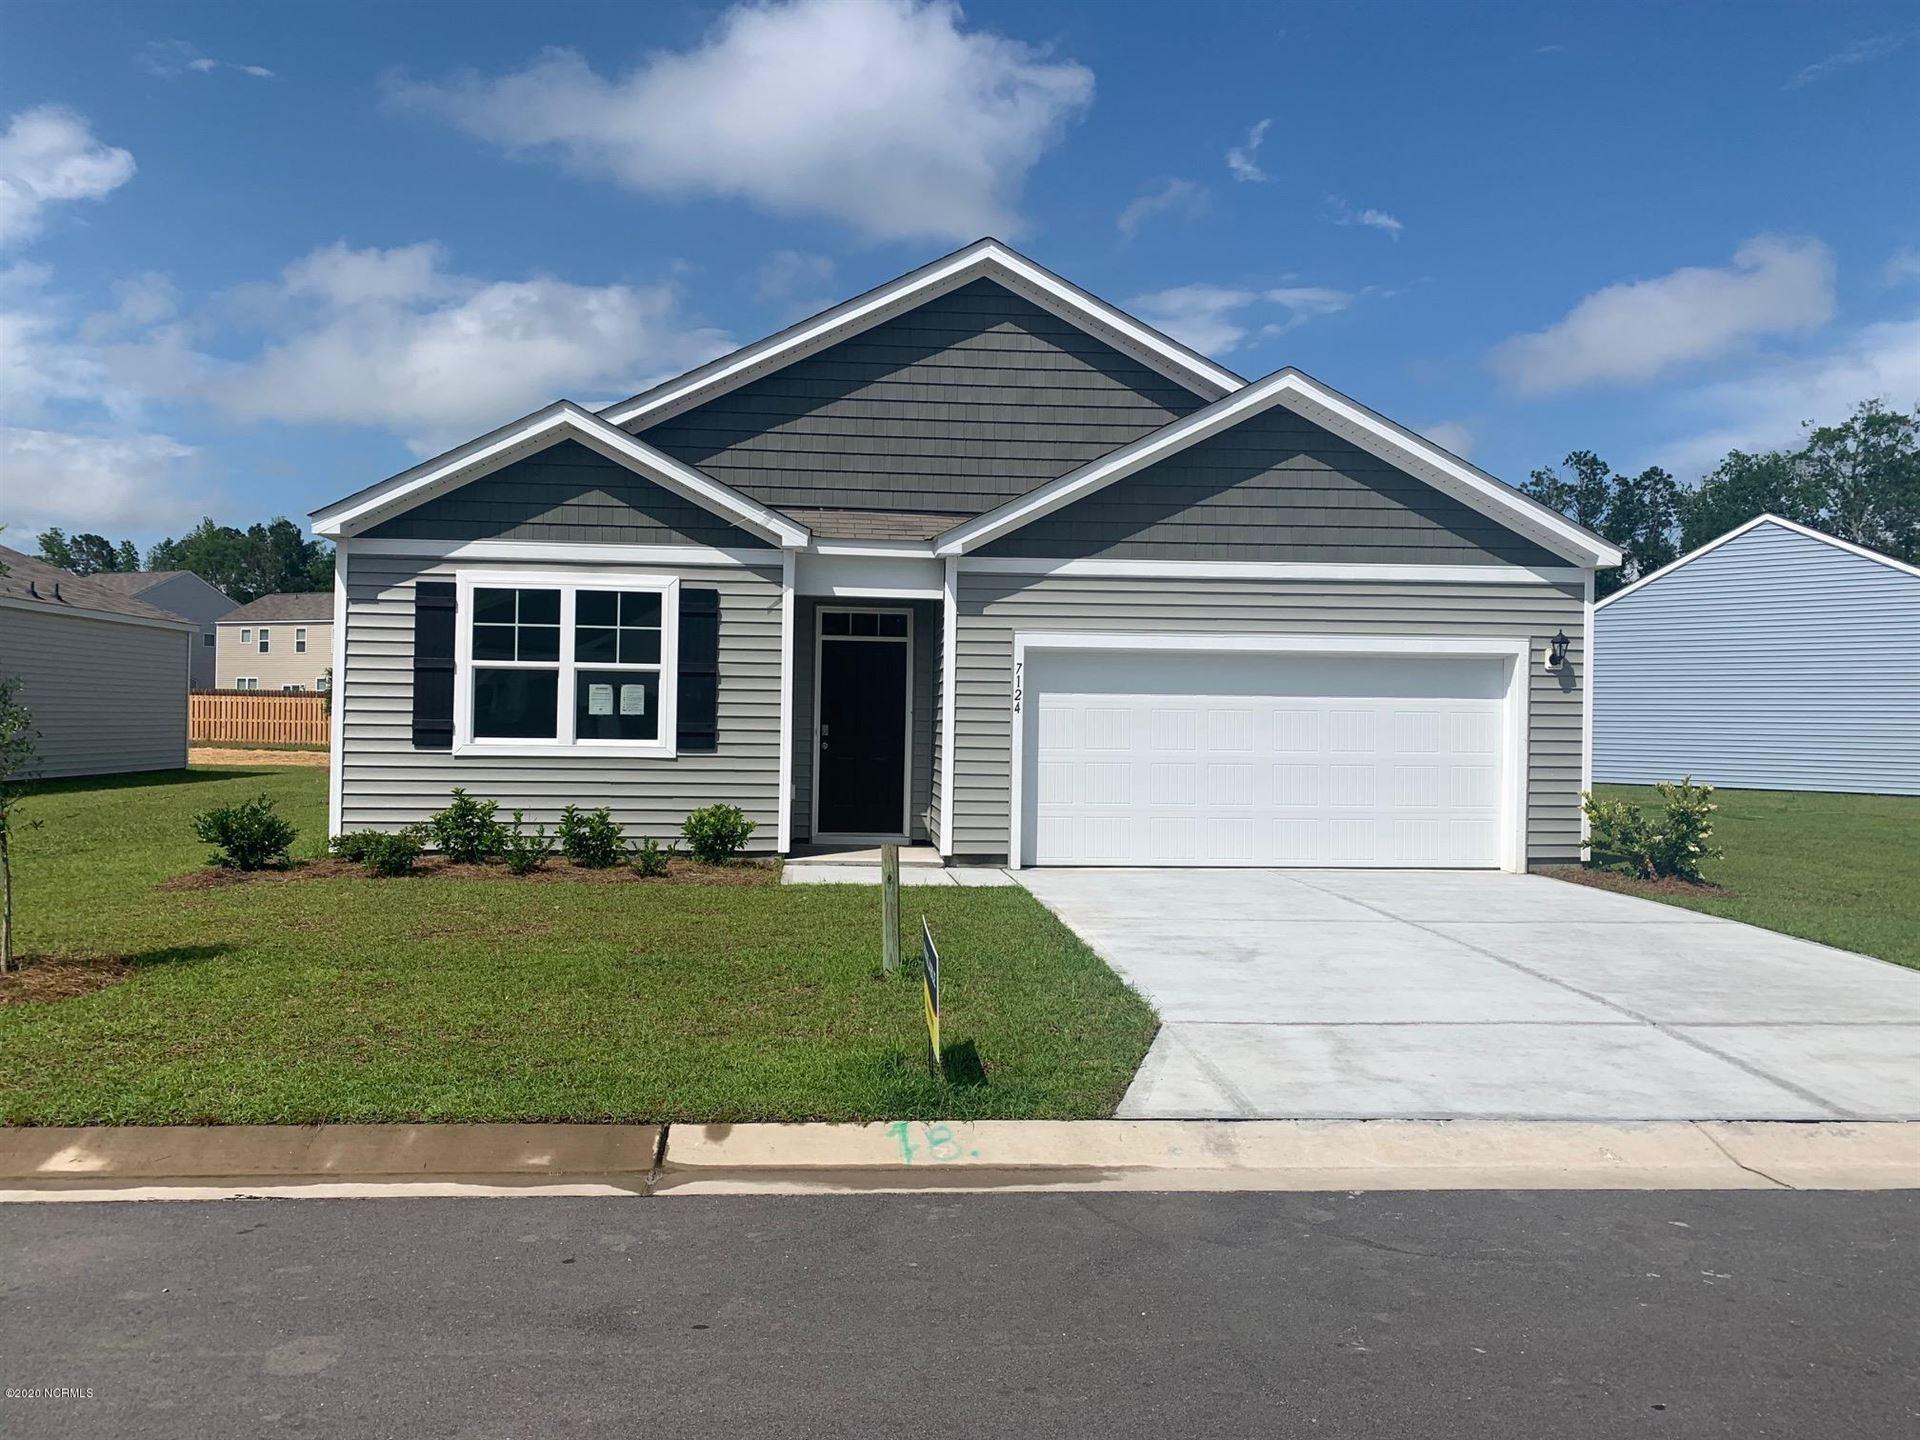 Photo for 9124 Saint Thomas Court Road #Lot 48, Wilmington, NC 28411 (MLS # 100273130)